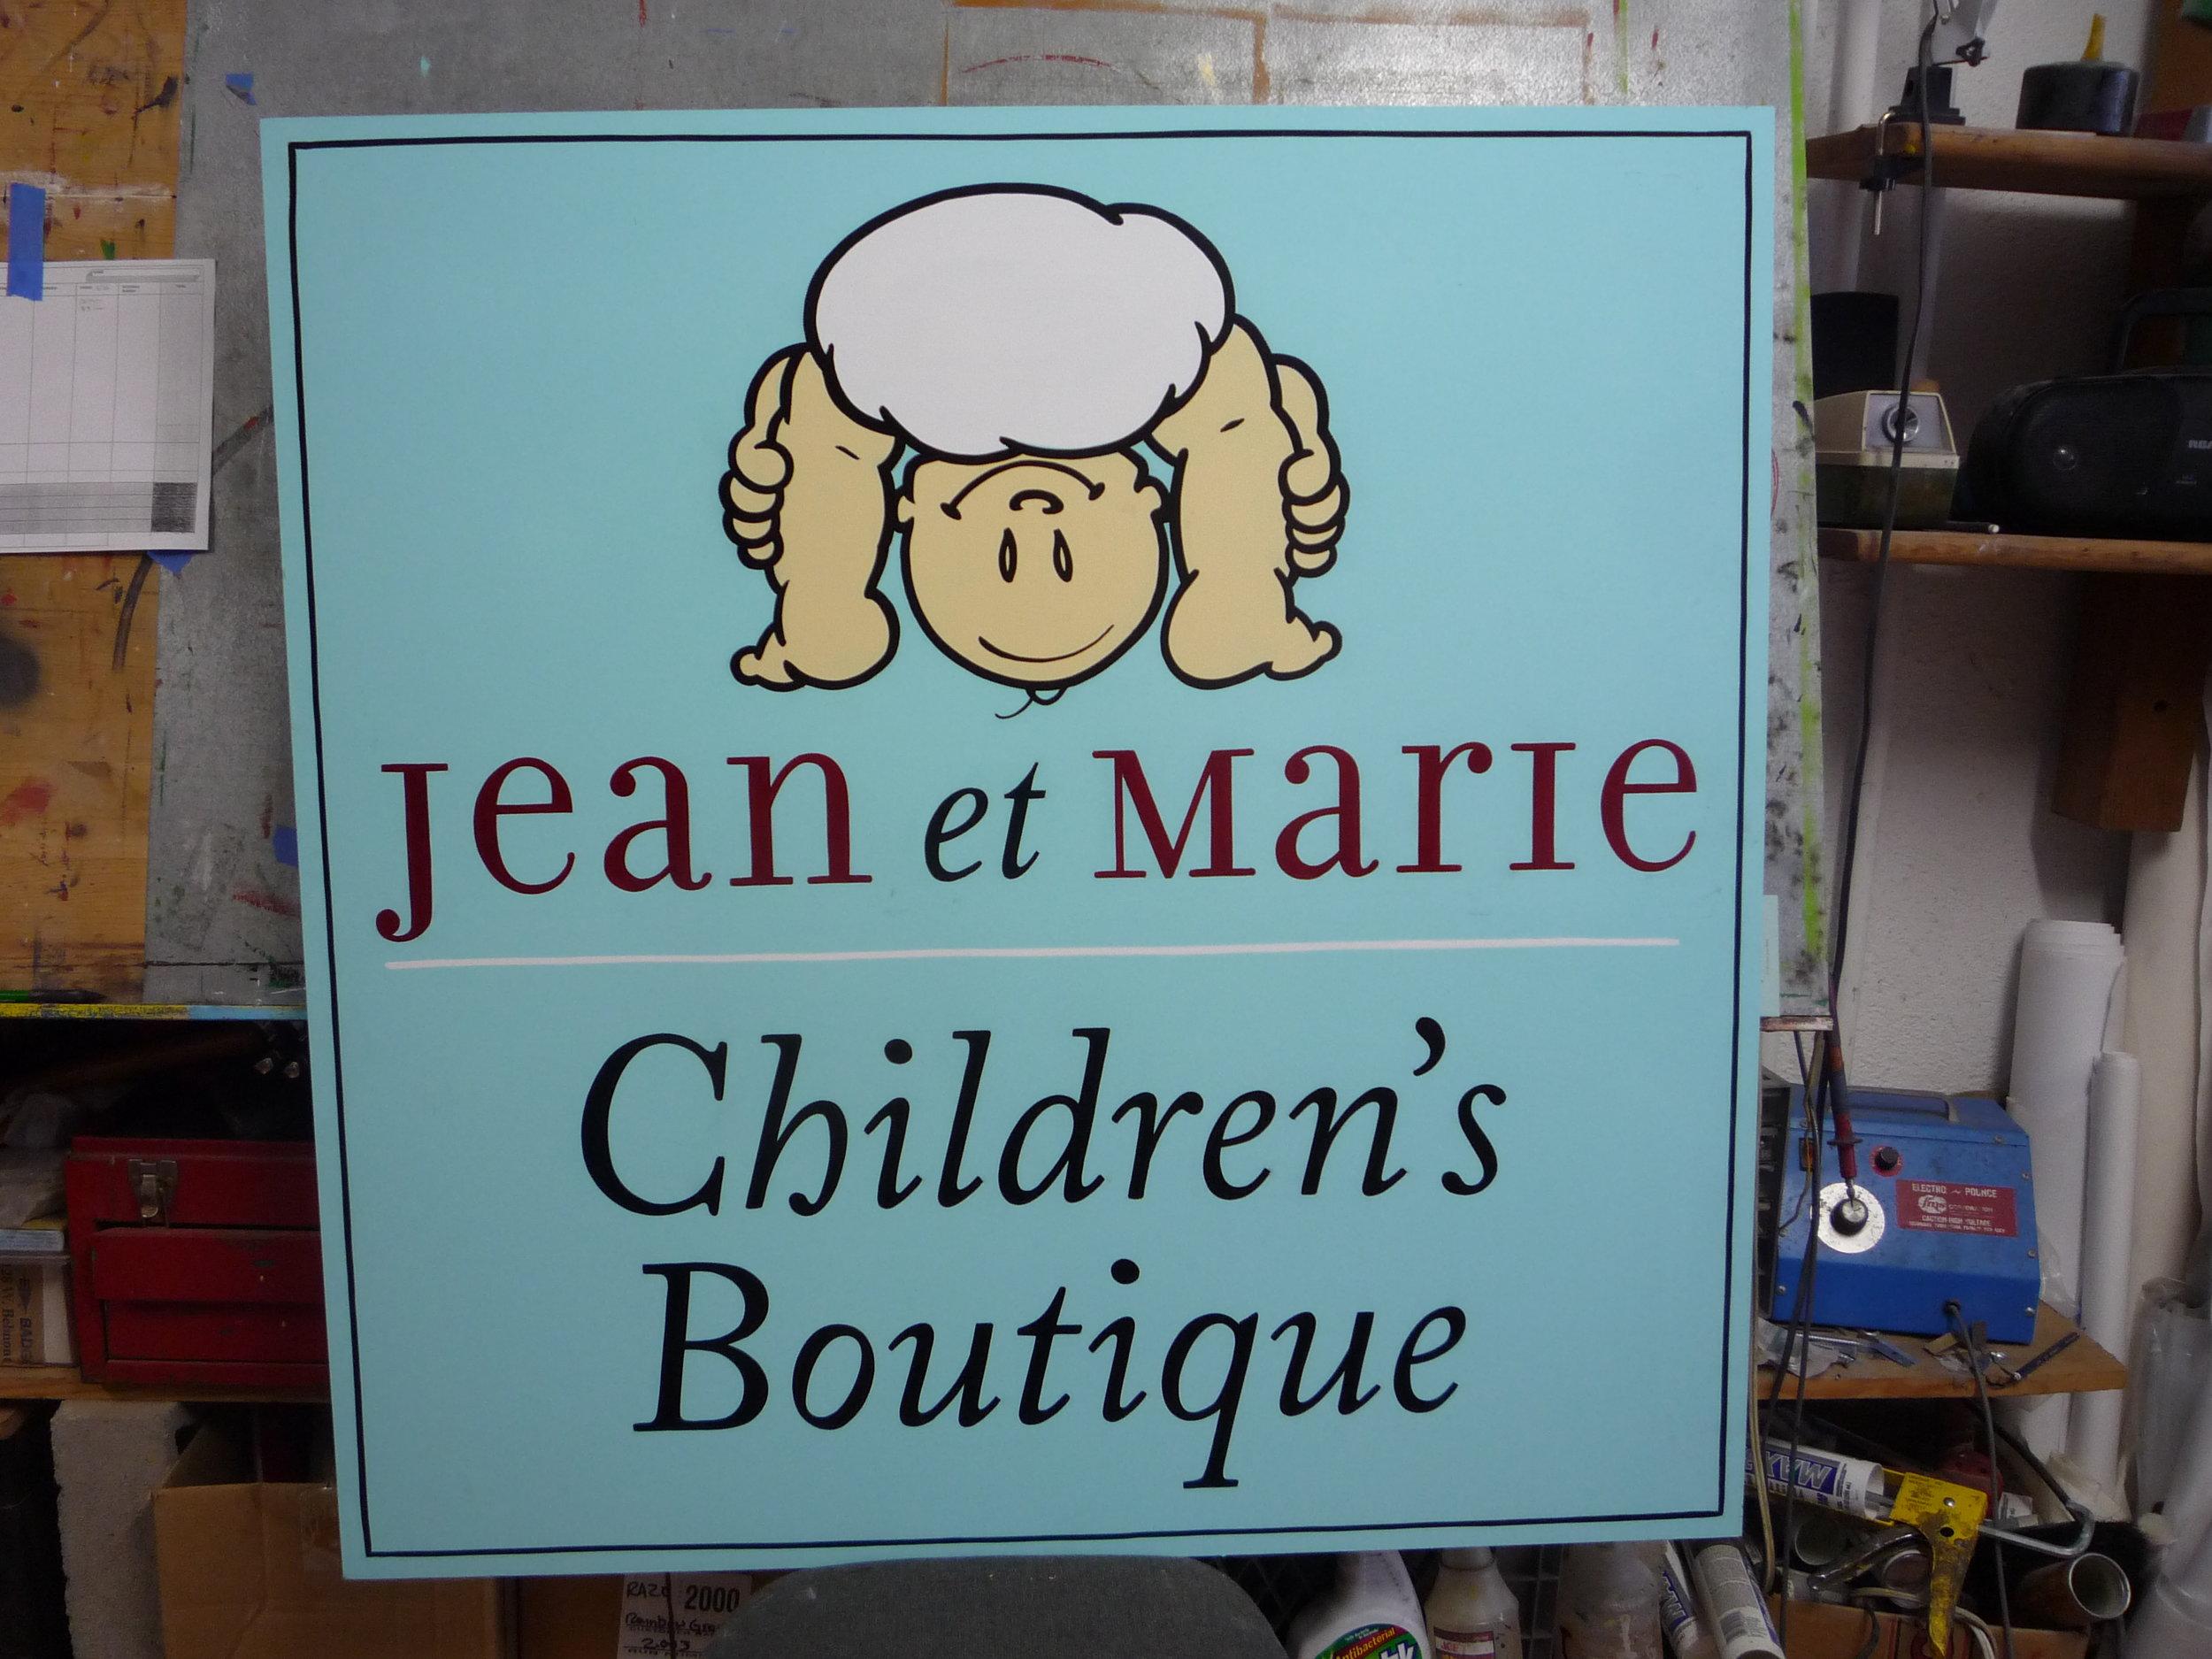 HAND-jean-et-marie_4306537075_o.jpg